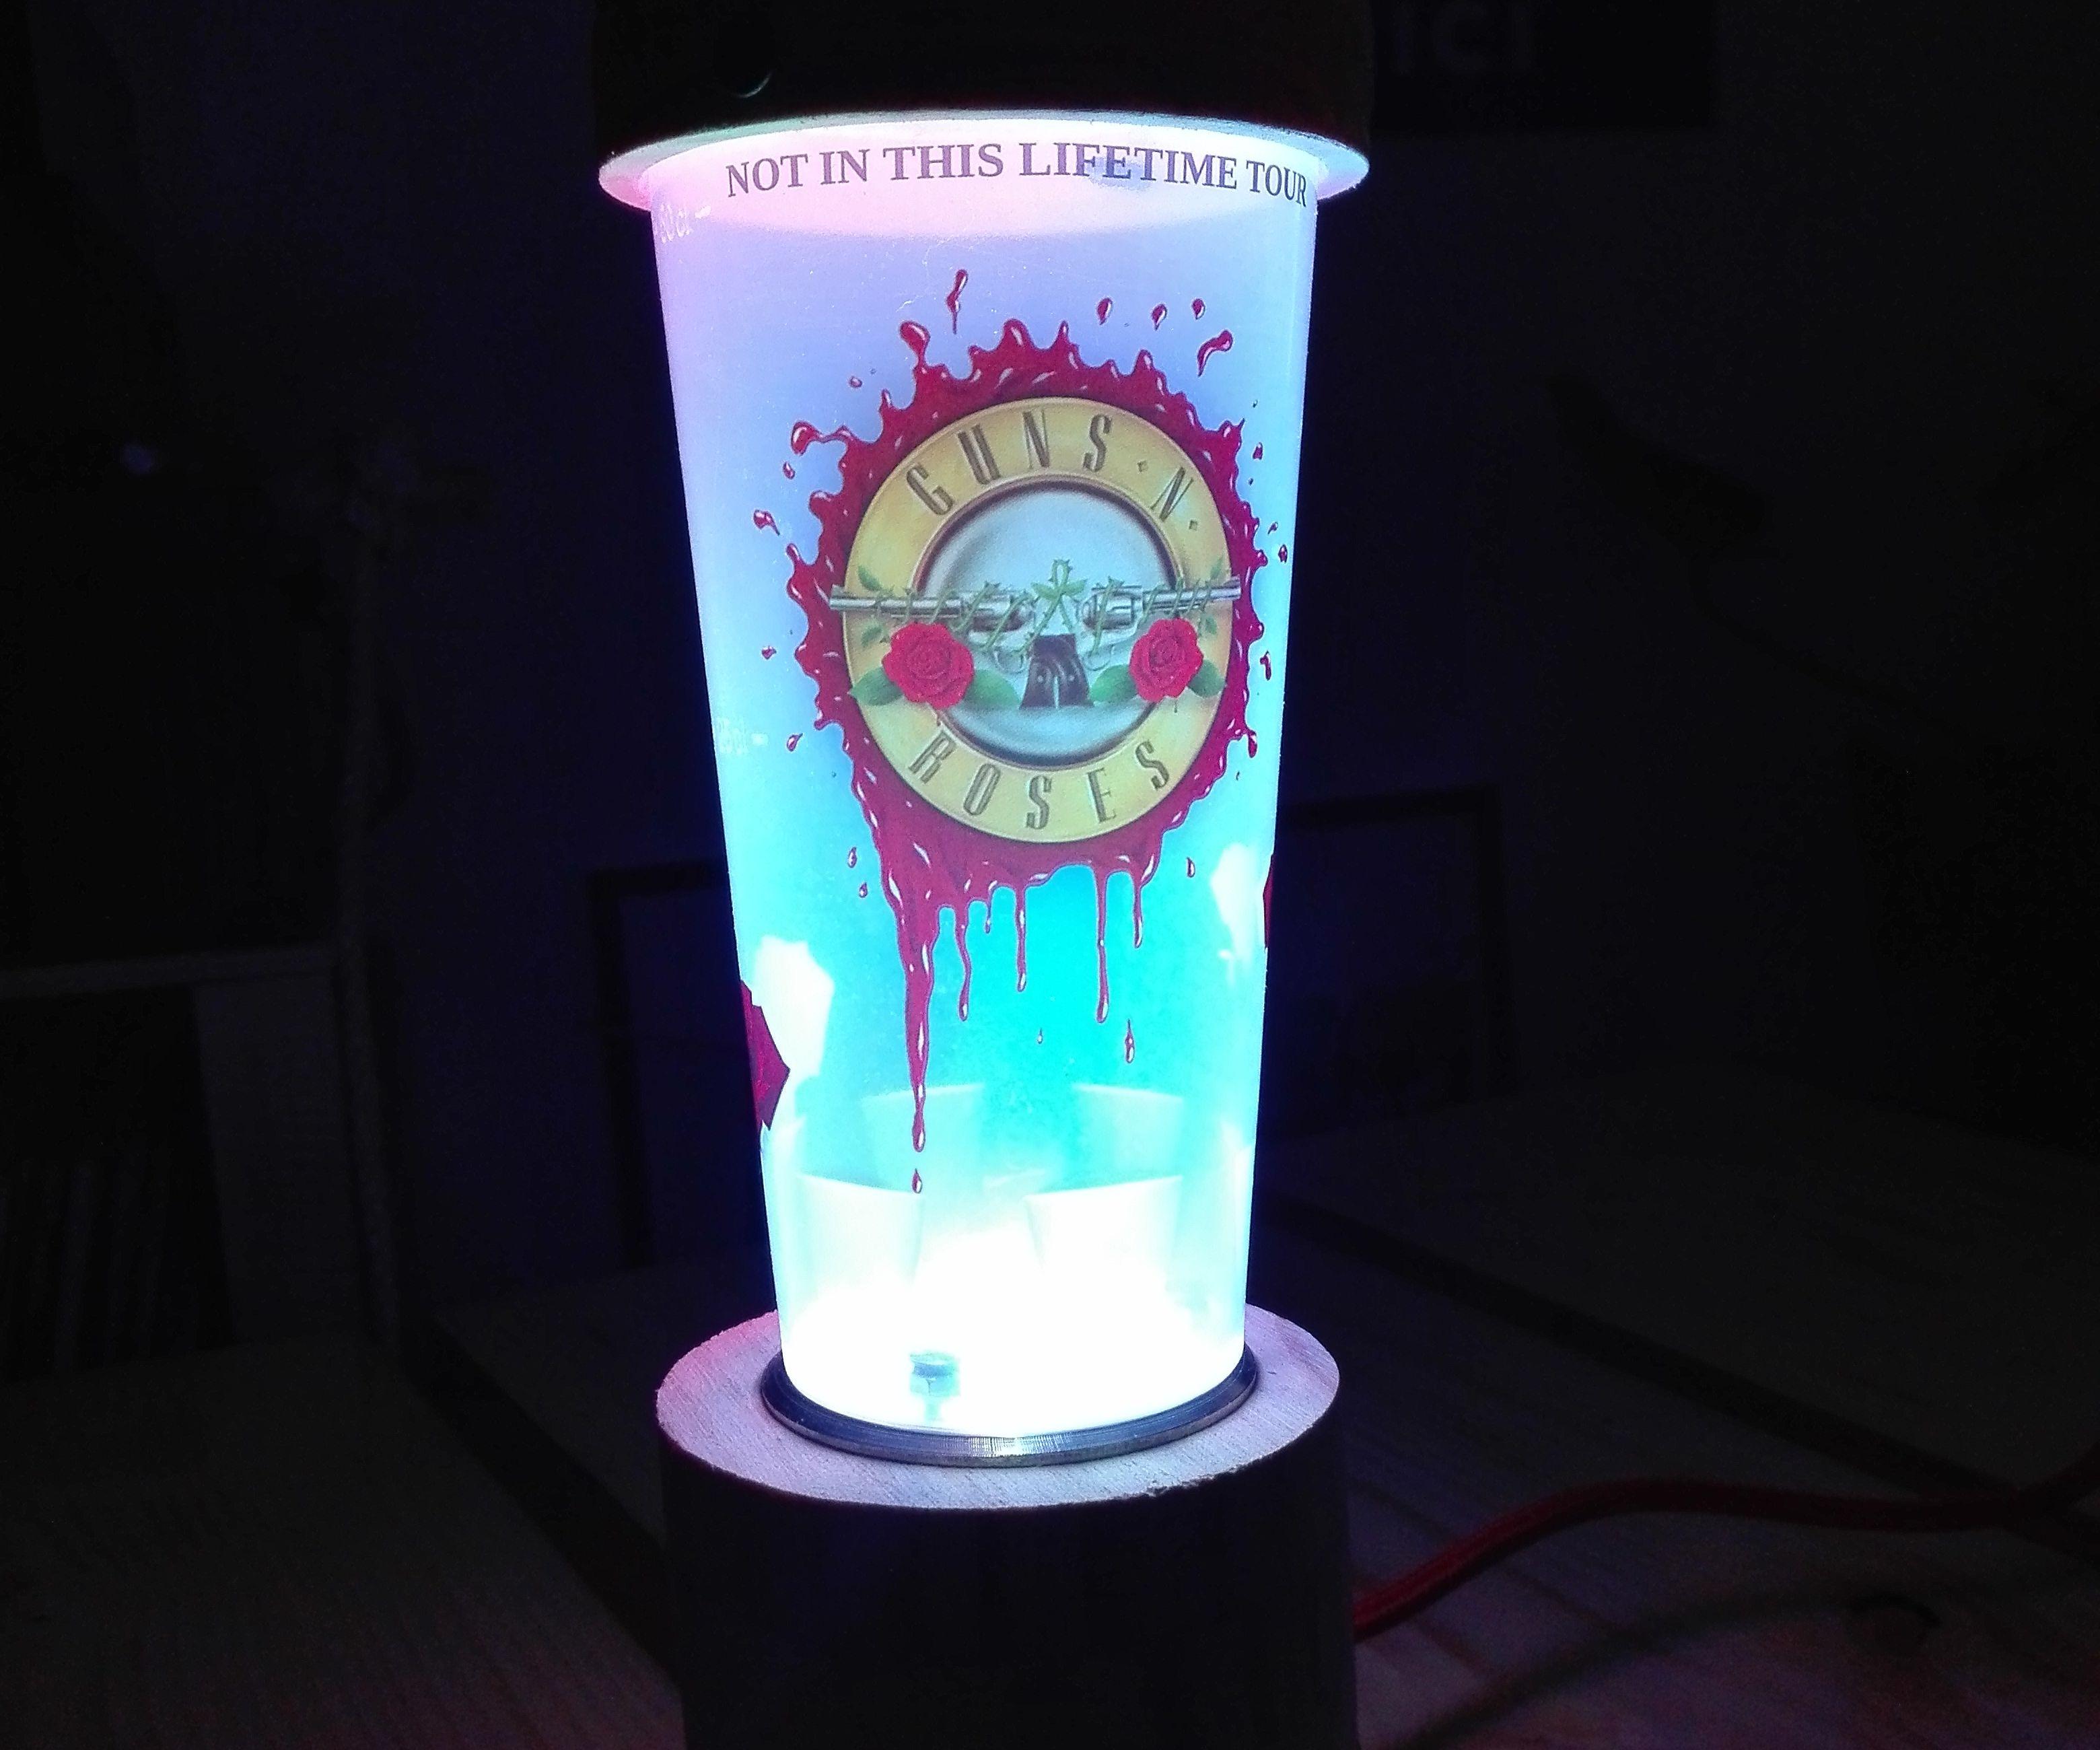 Guns N' Roses Ecocup Lamp